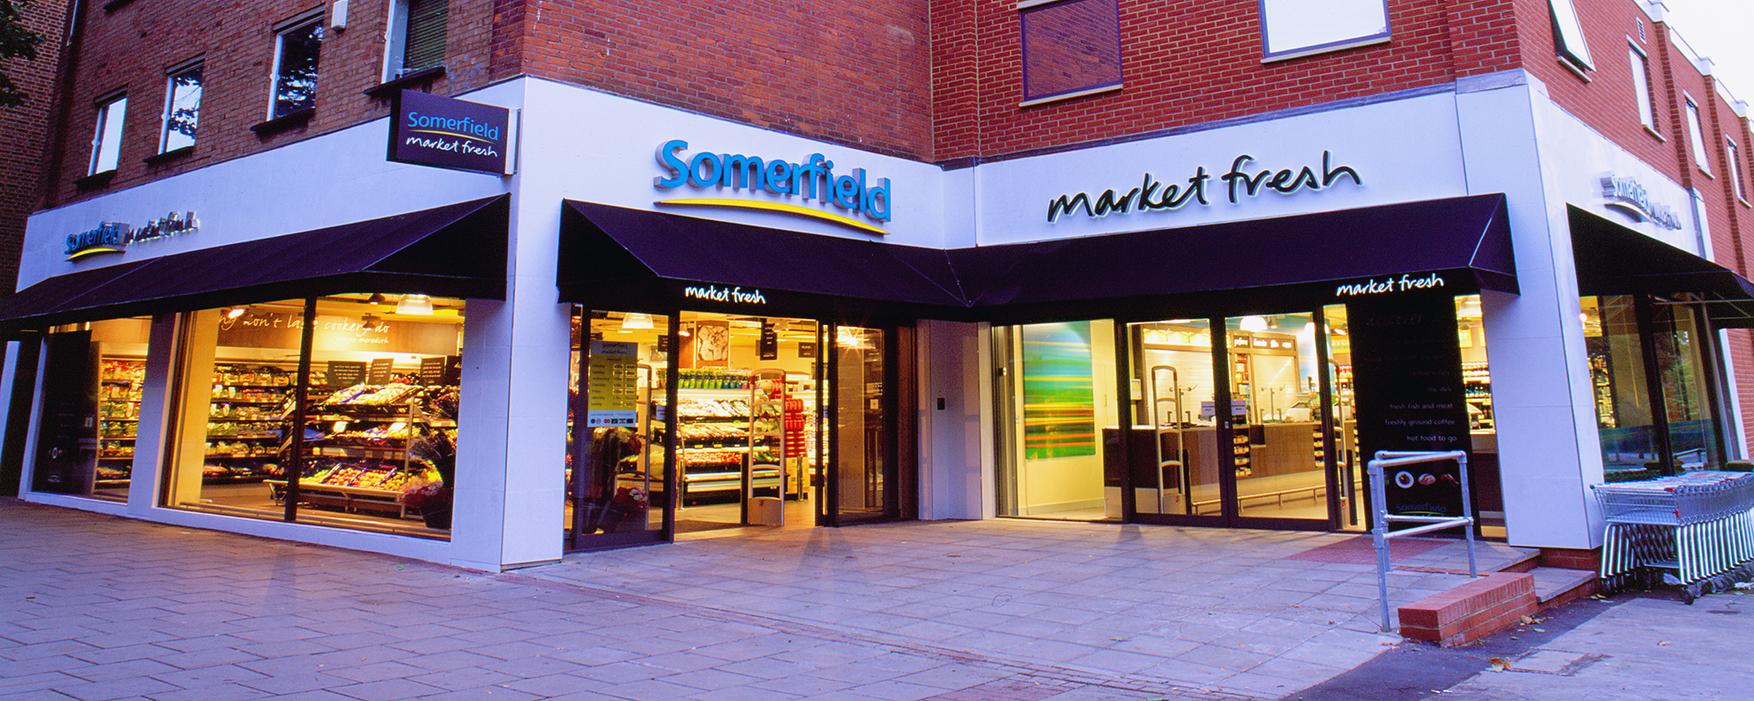 Somerfield 2 A4 150dpi.jpg